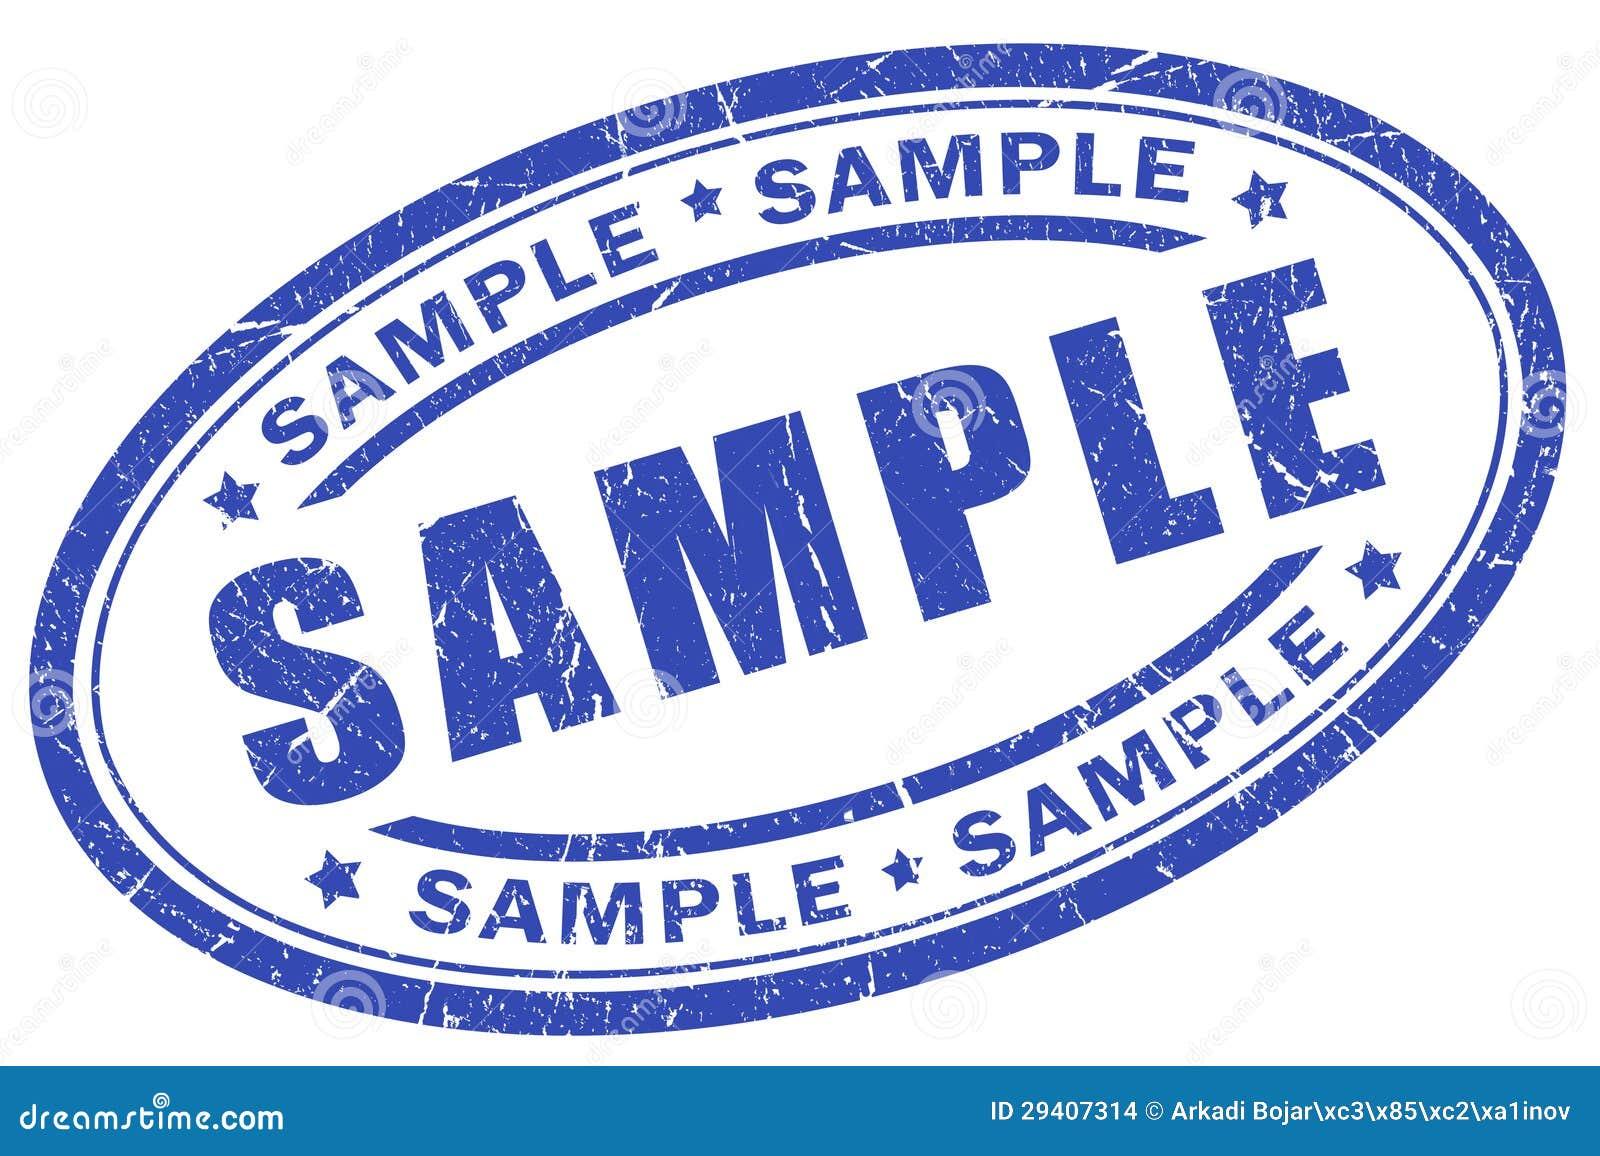 Http Www Dreamstime Com Stock Images Sample Stamp Image29407314